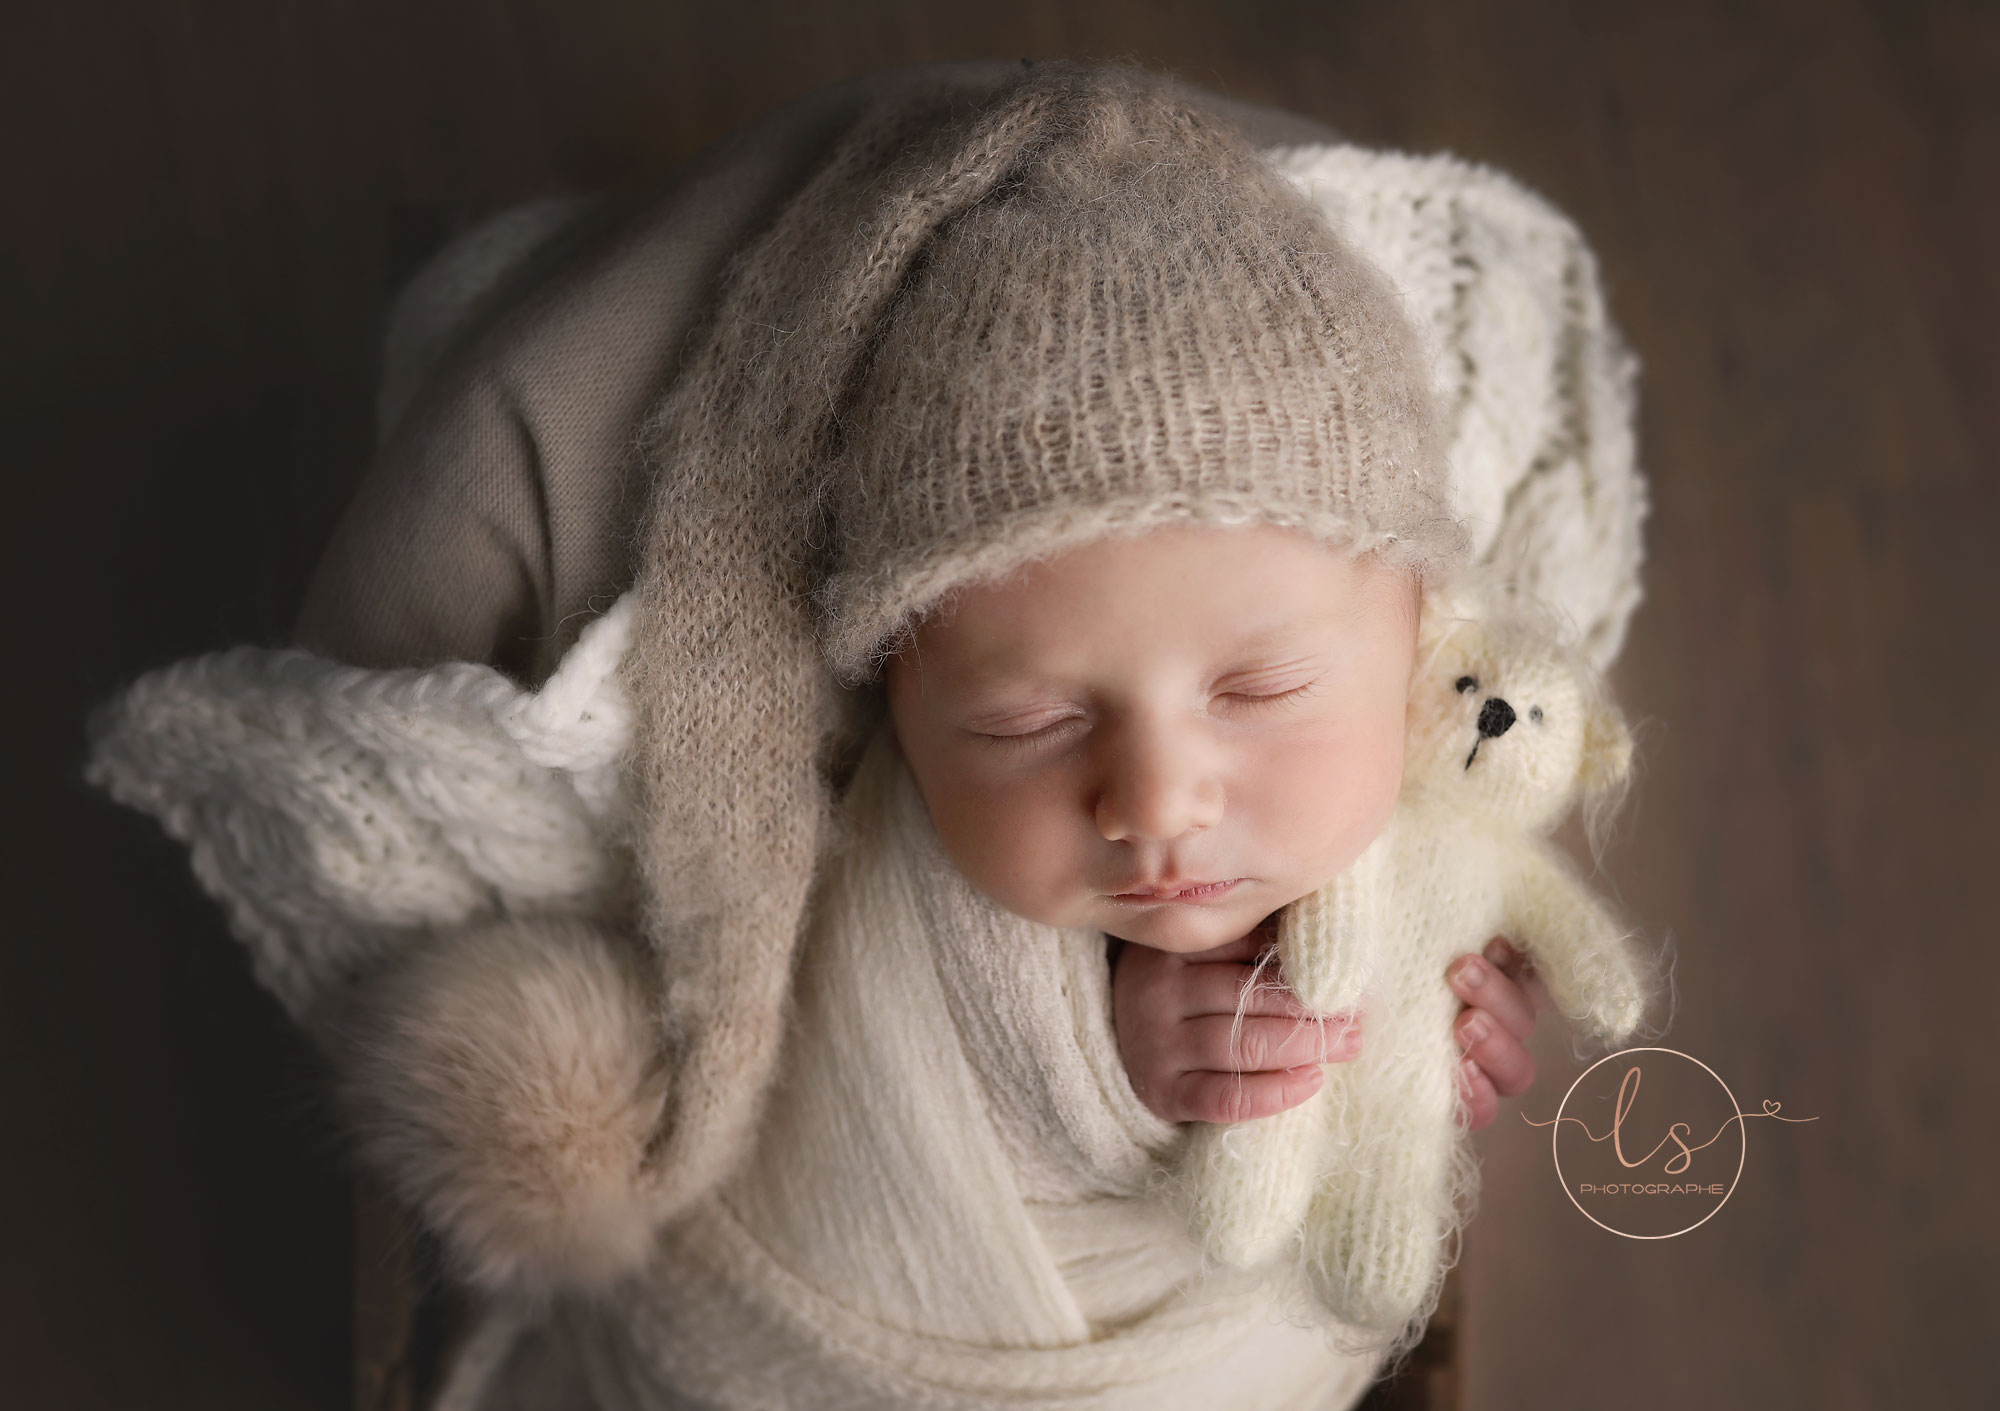 séance naissance studio Liège photographe